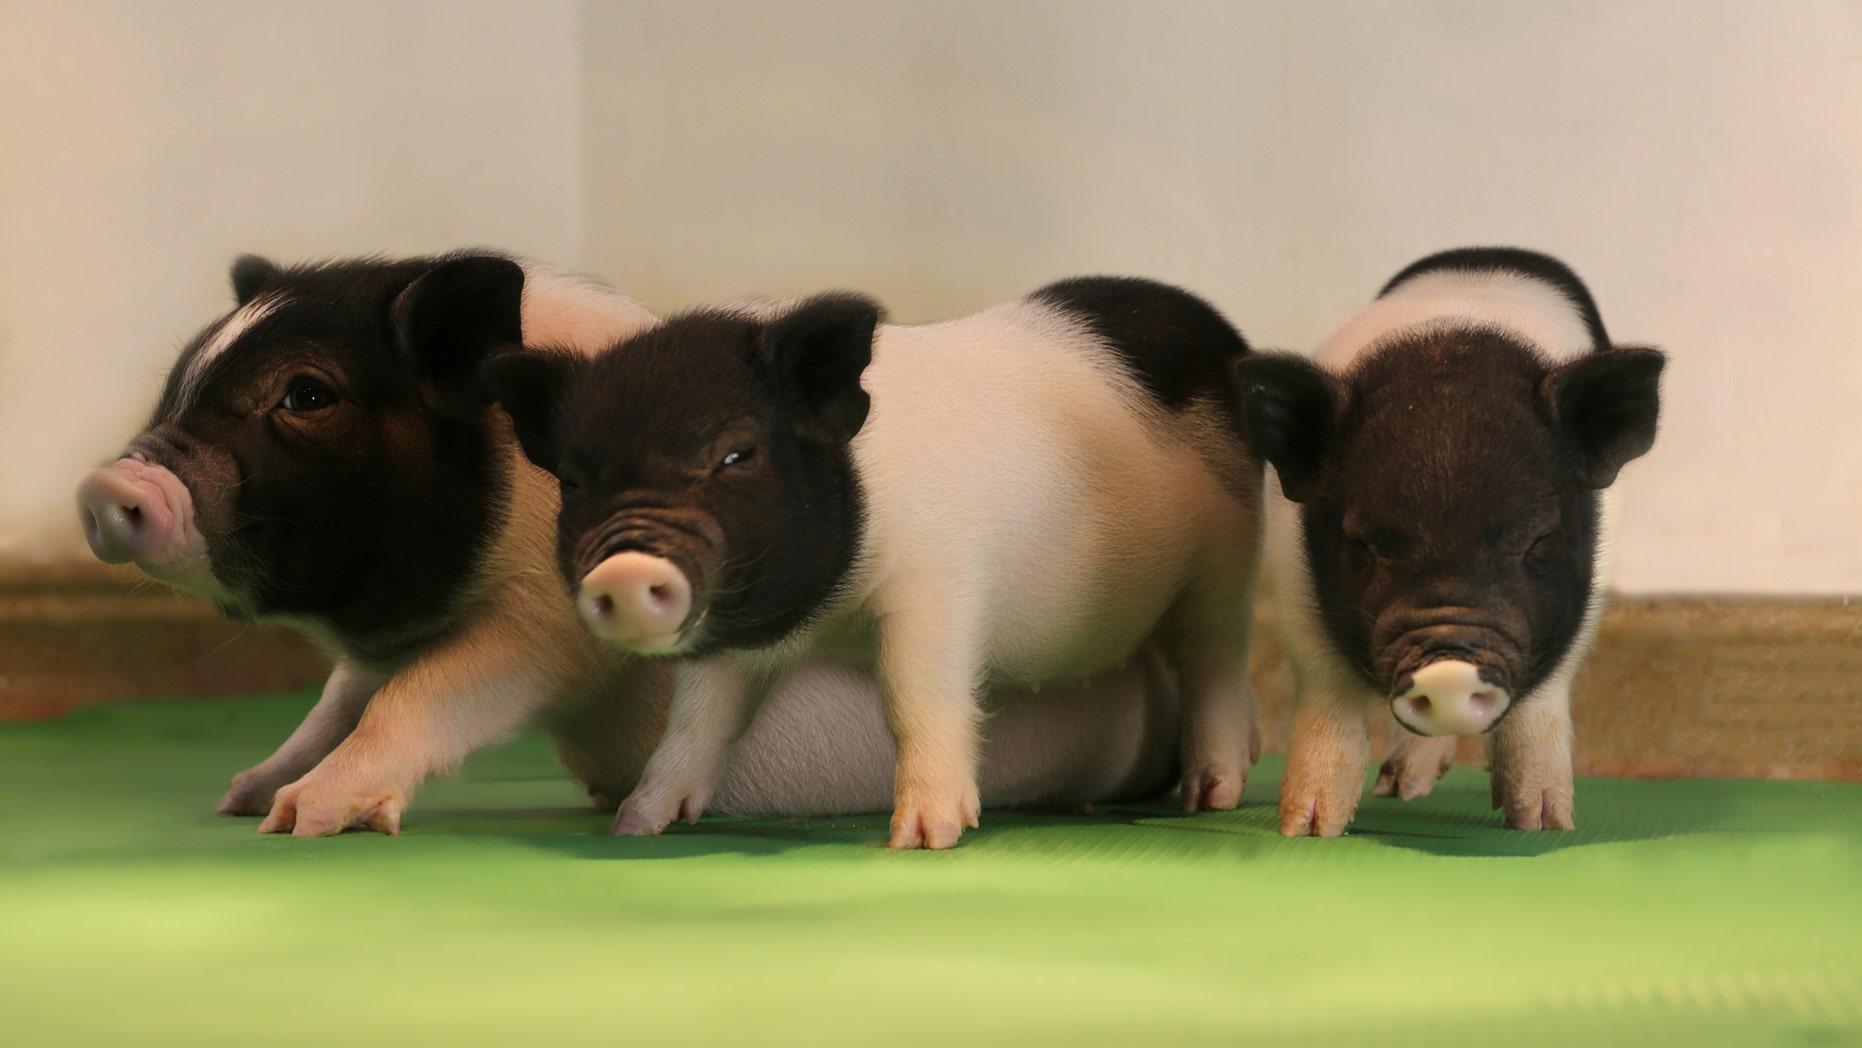 Three of the genetically engineered piglets (eGenesis).